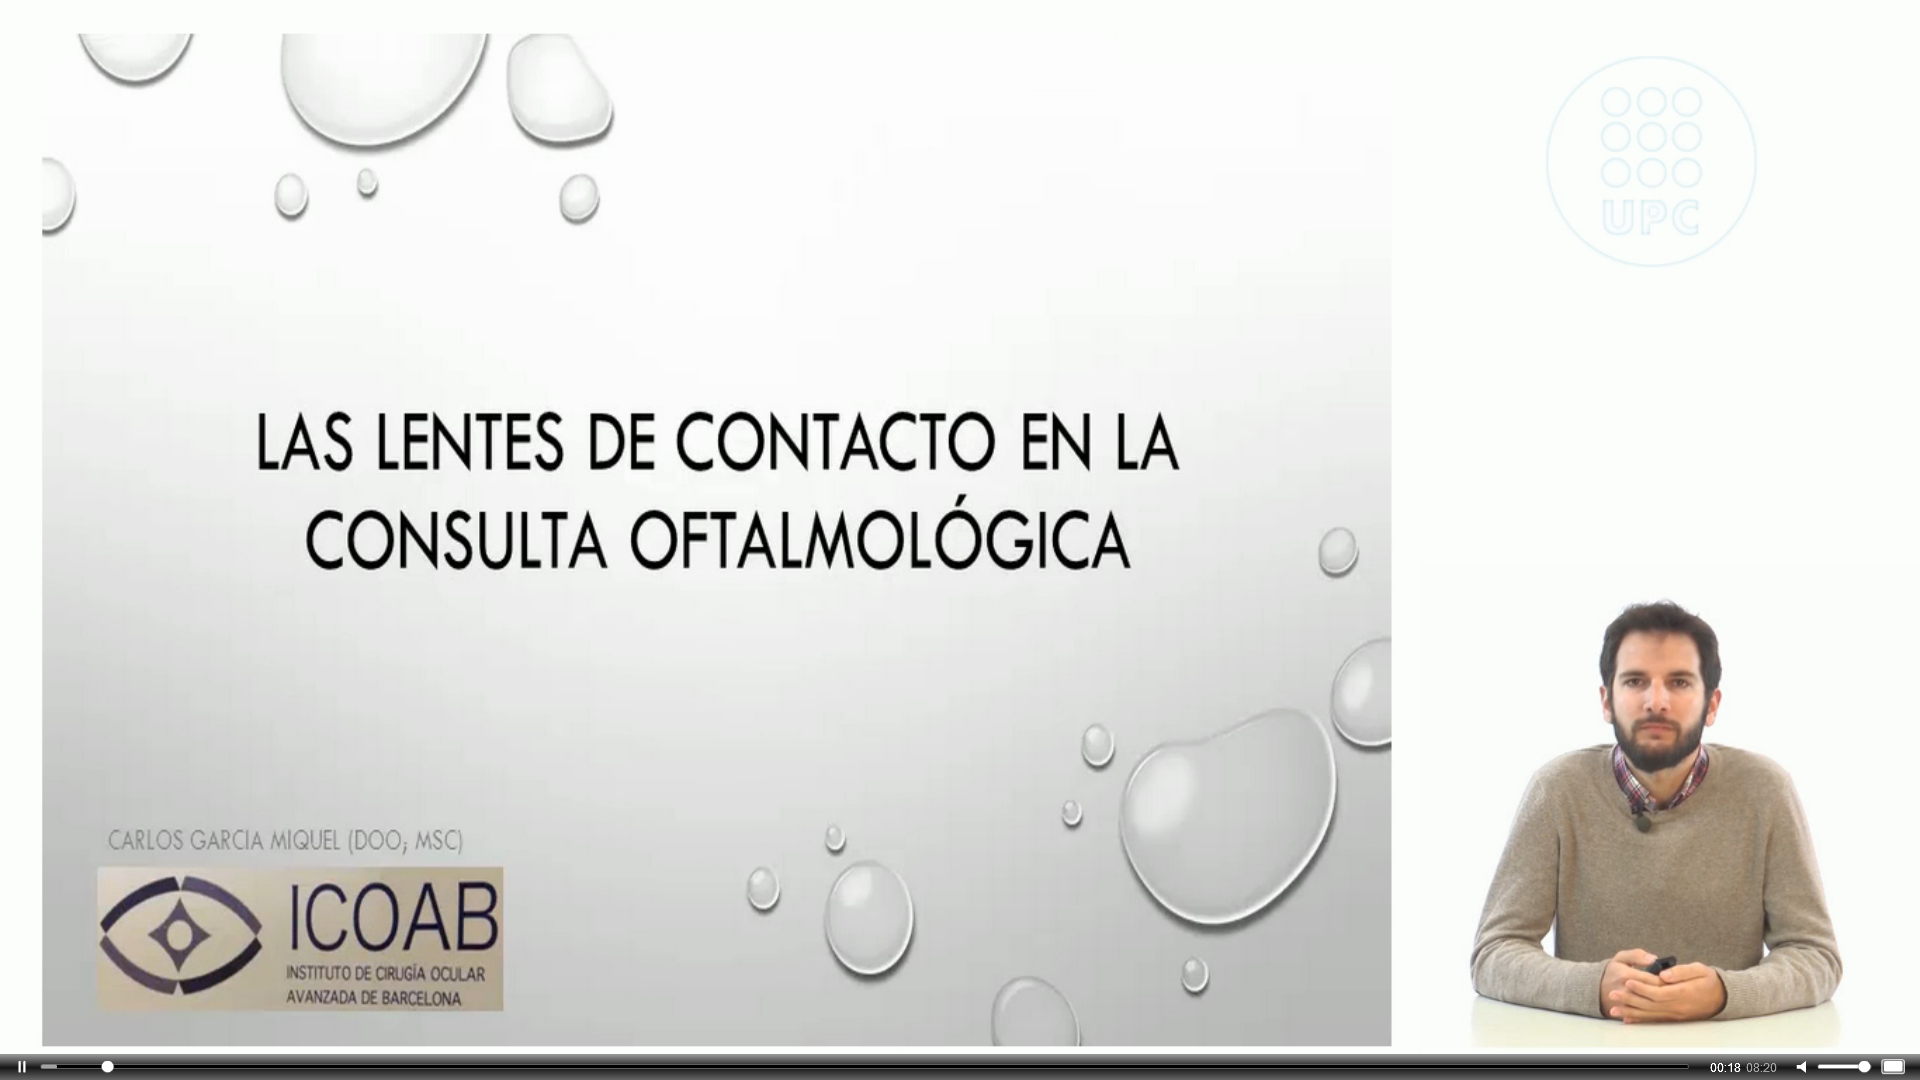 JLC2016_LC_consulta_oftalmologica(Carles_Garcia)